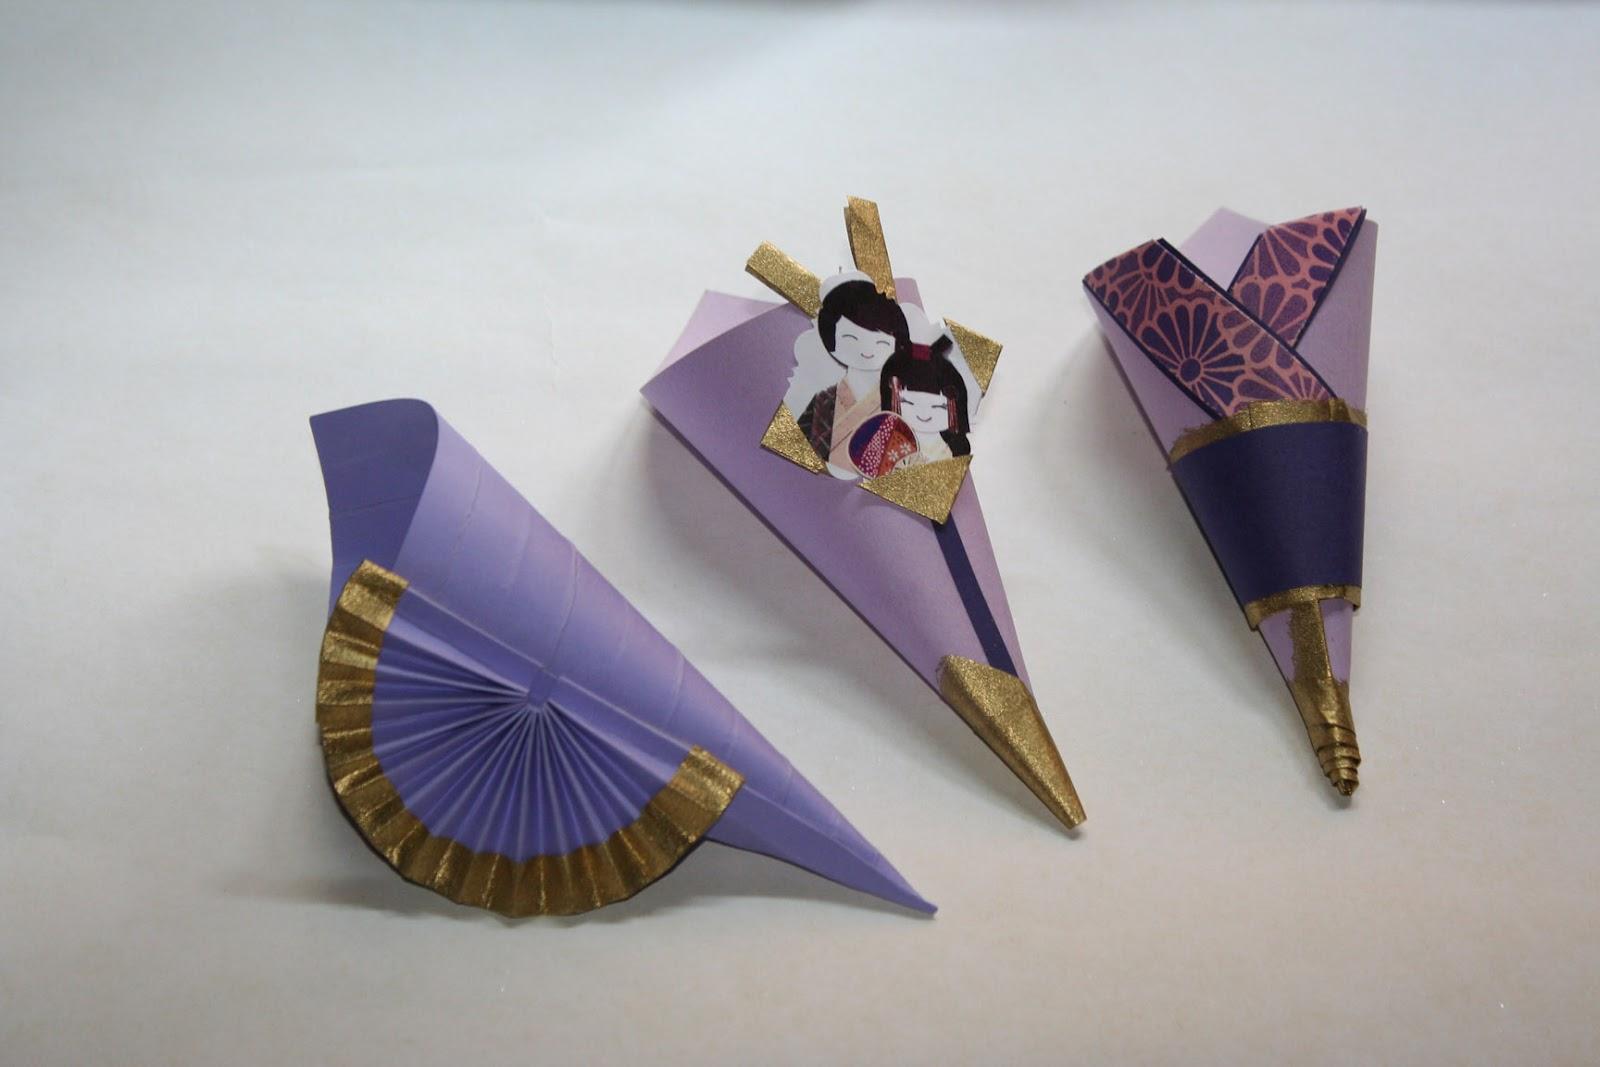 Famoso cornetti matrimonio stile giapponese | Kartouche! Atelier Artistico FM39